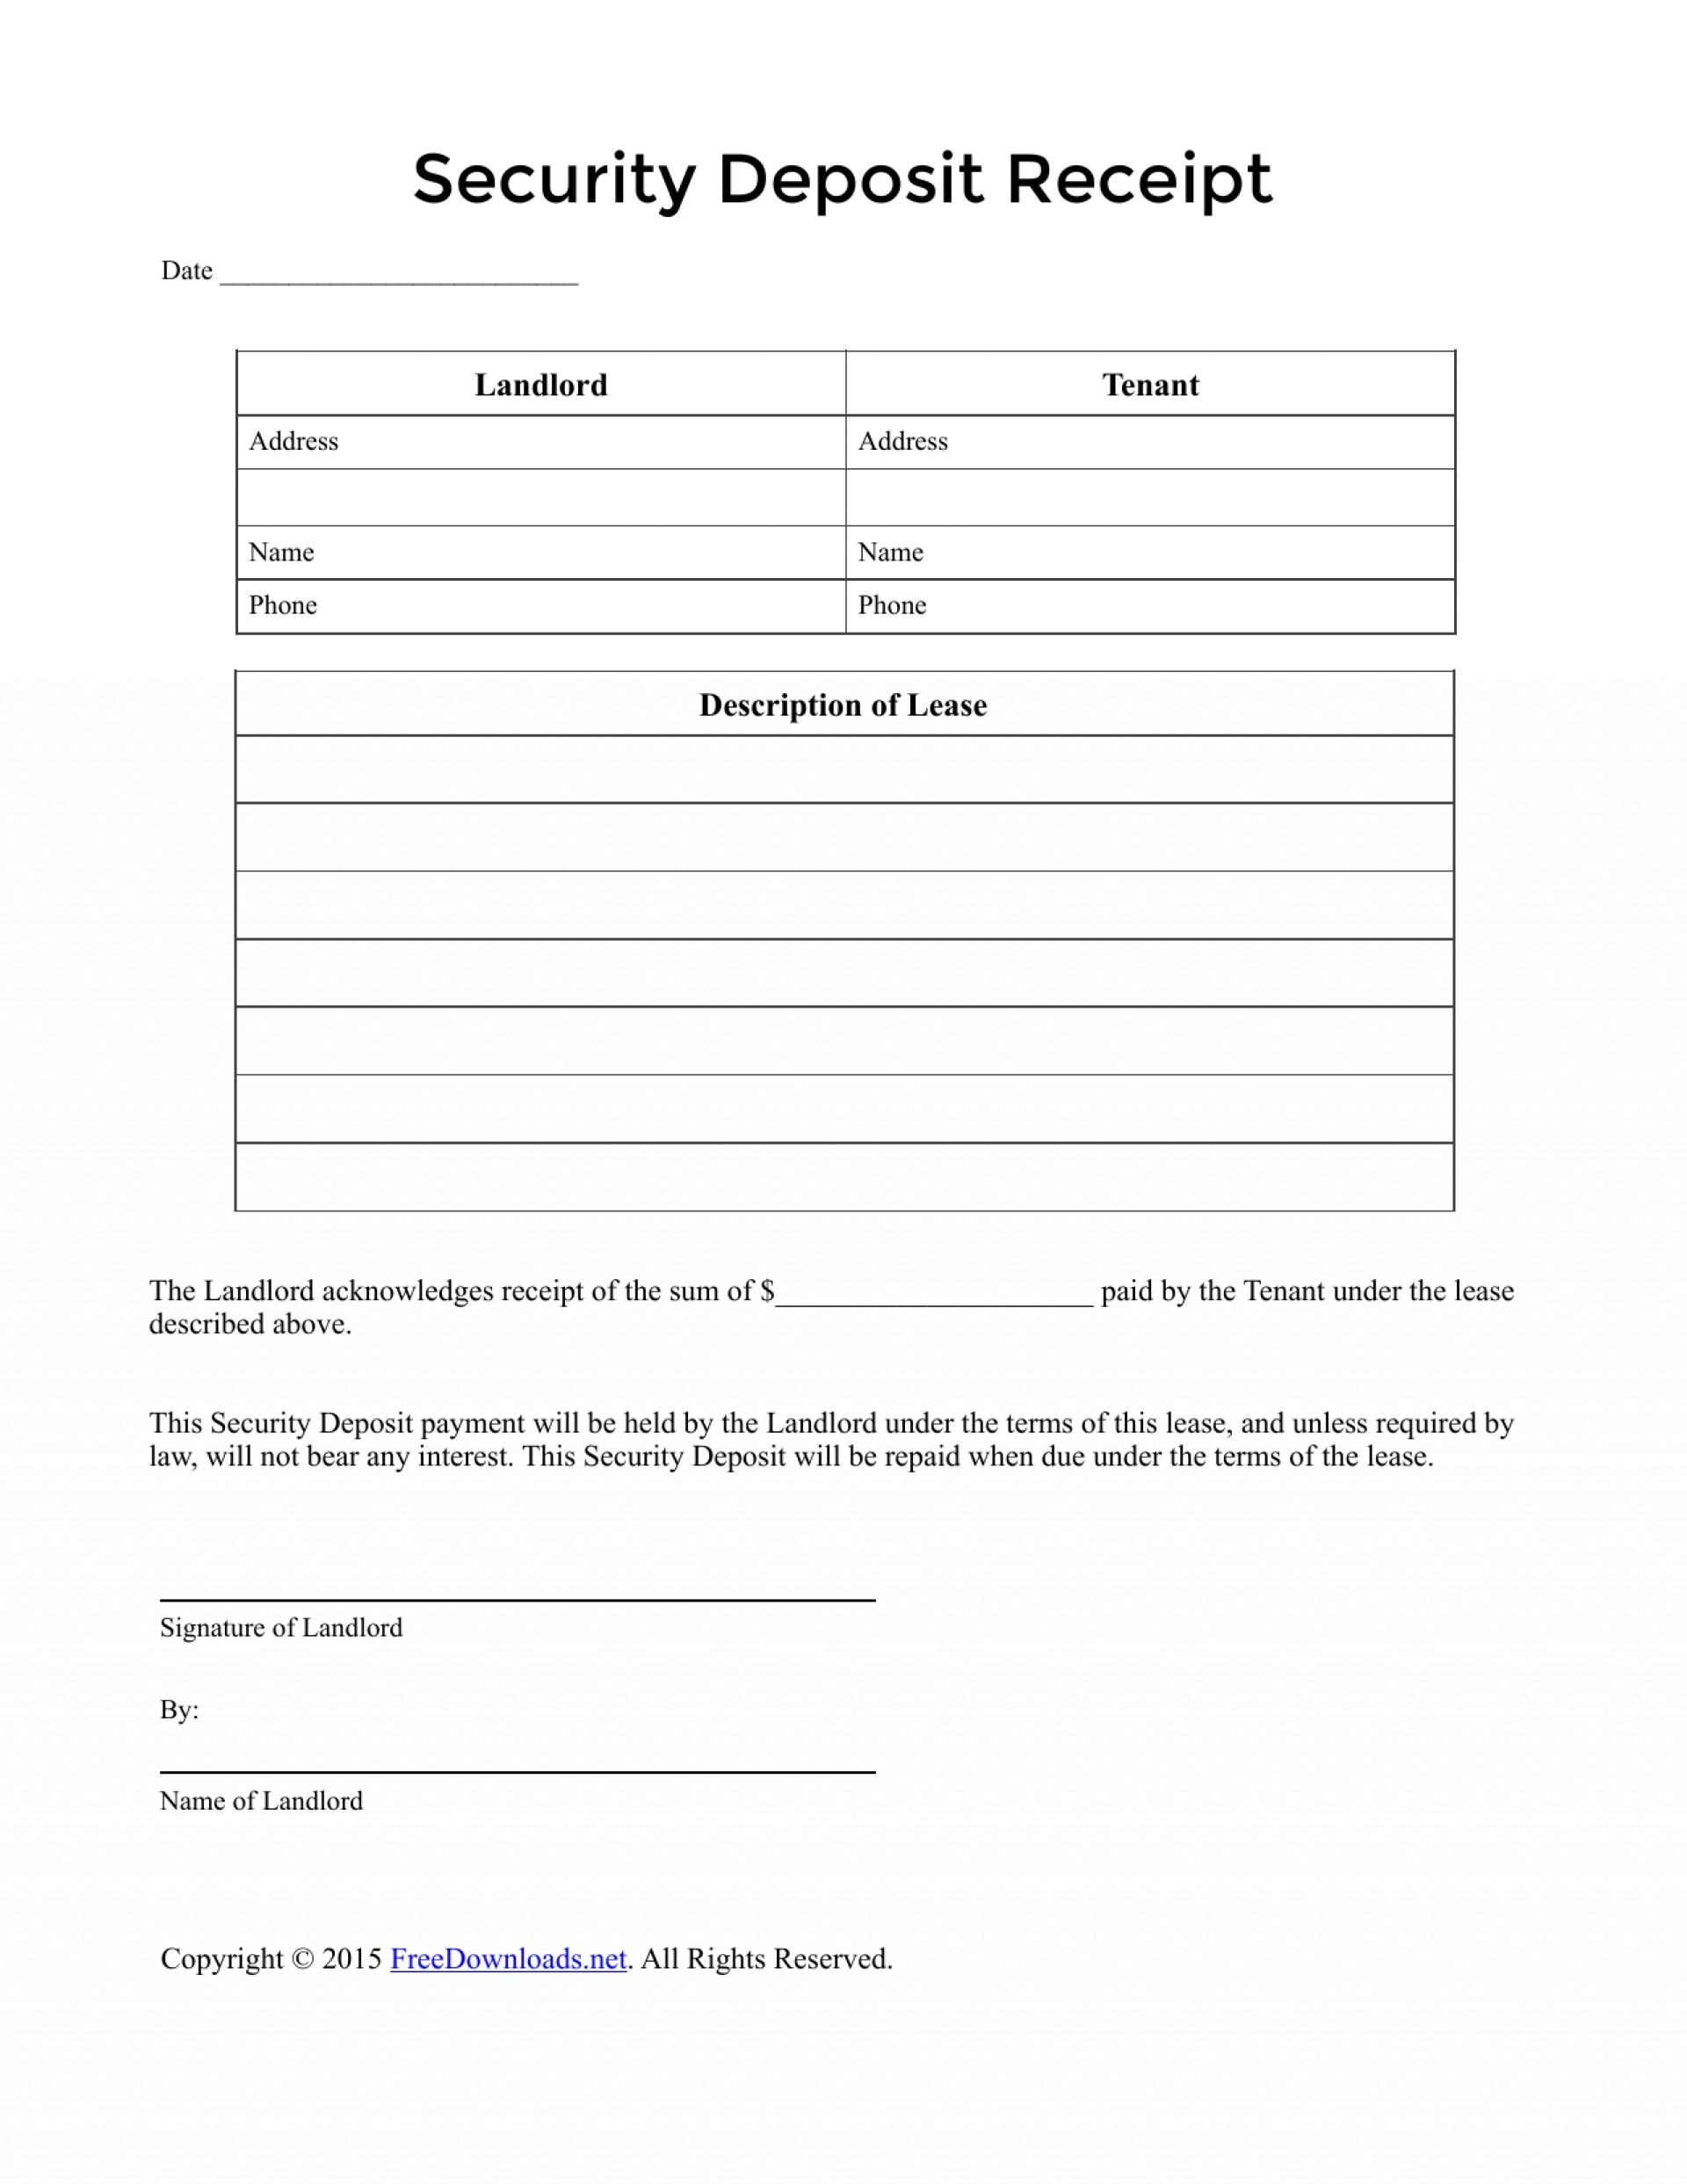 Free Rental Deposit Receipt Form